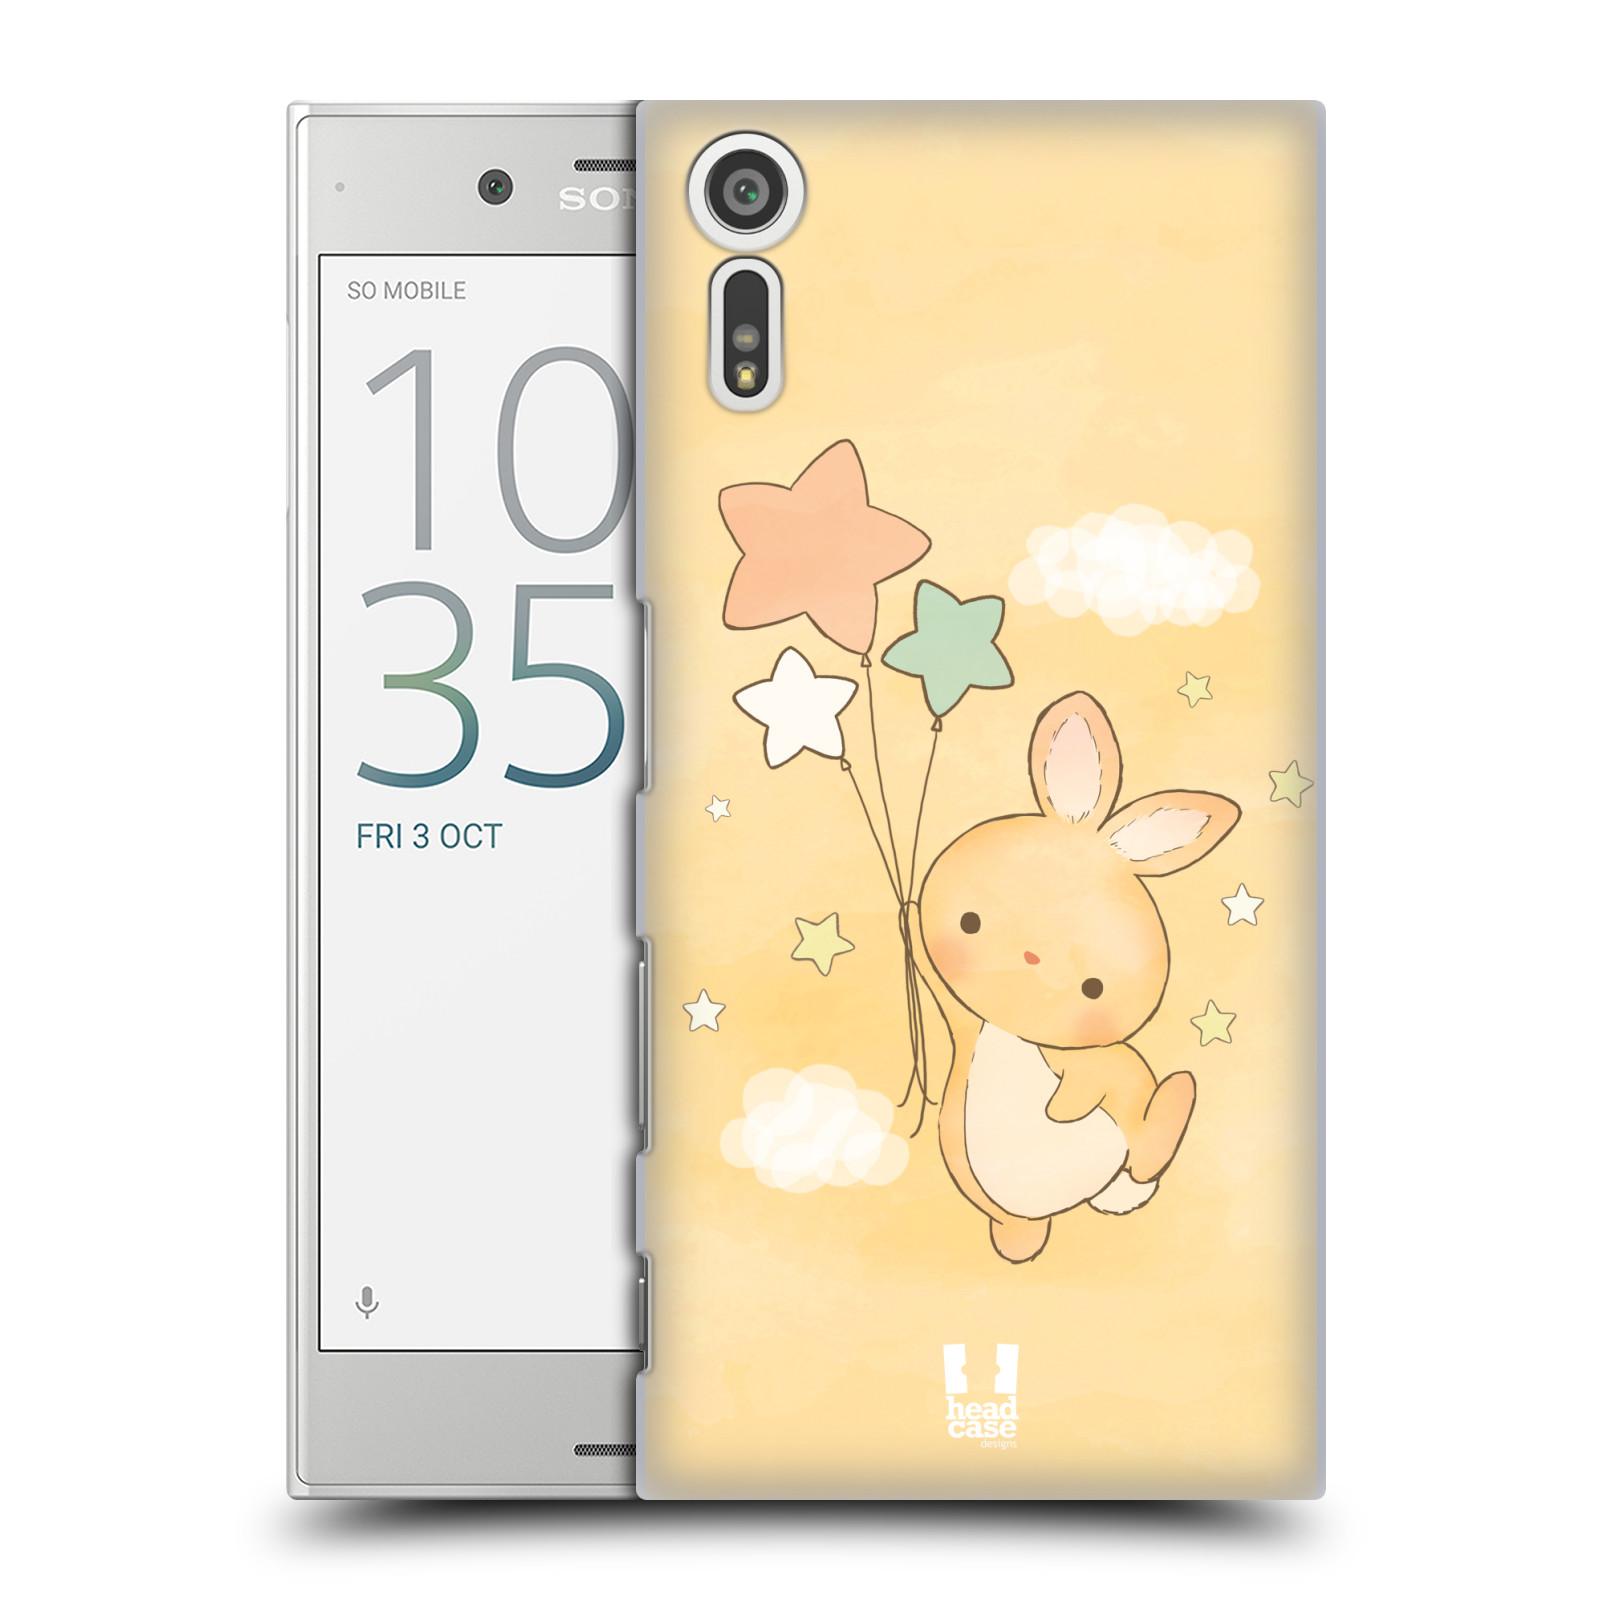 HEAD CASE plastový obal na mobil Sony Xperia XZ vzor králíček a hvězdy žlutá